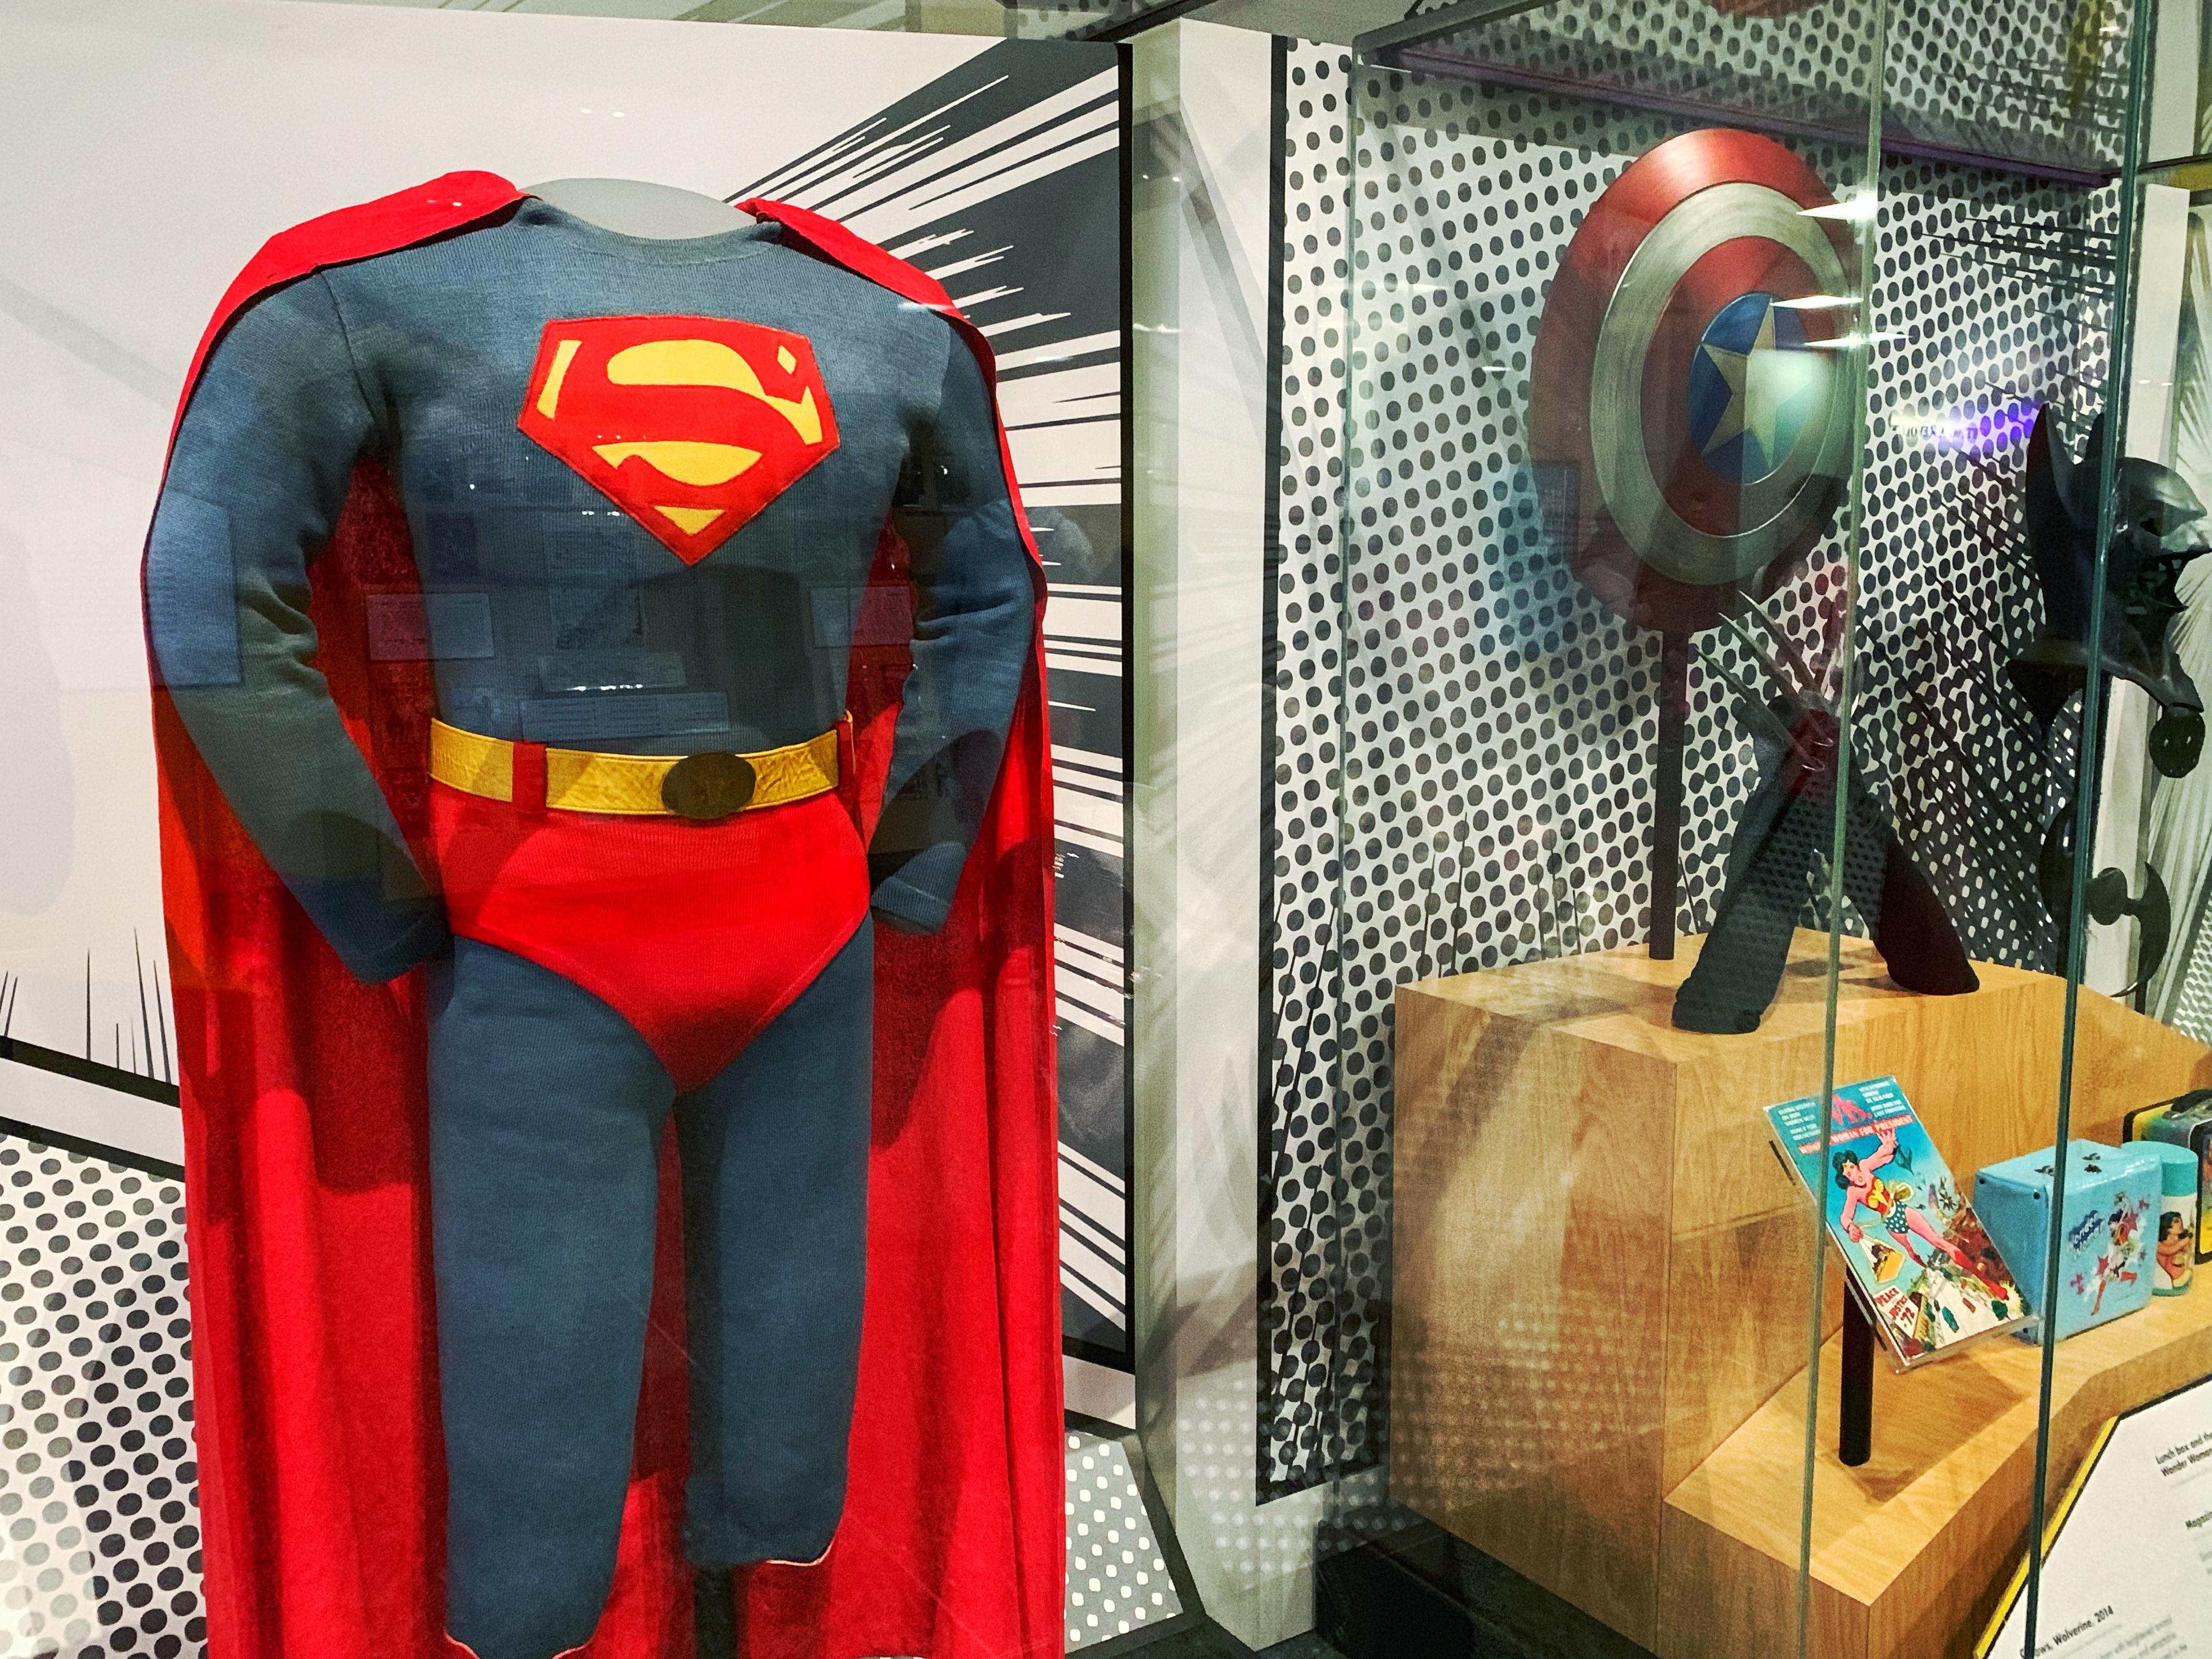 Smithsonian National Museum of American History's Superhero Exhibit